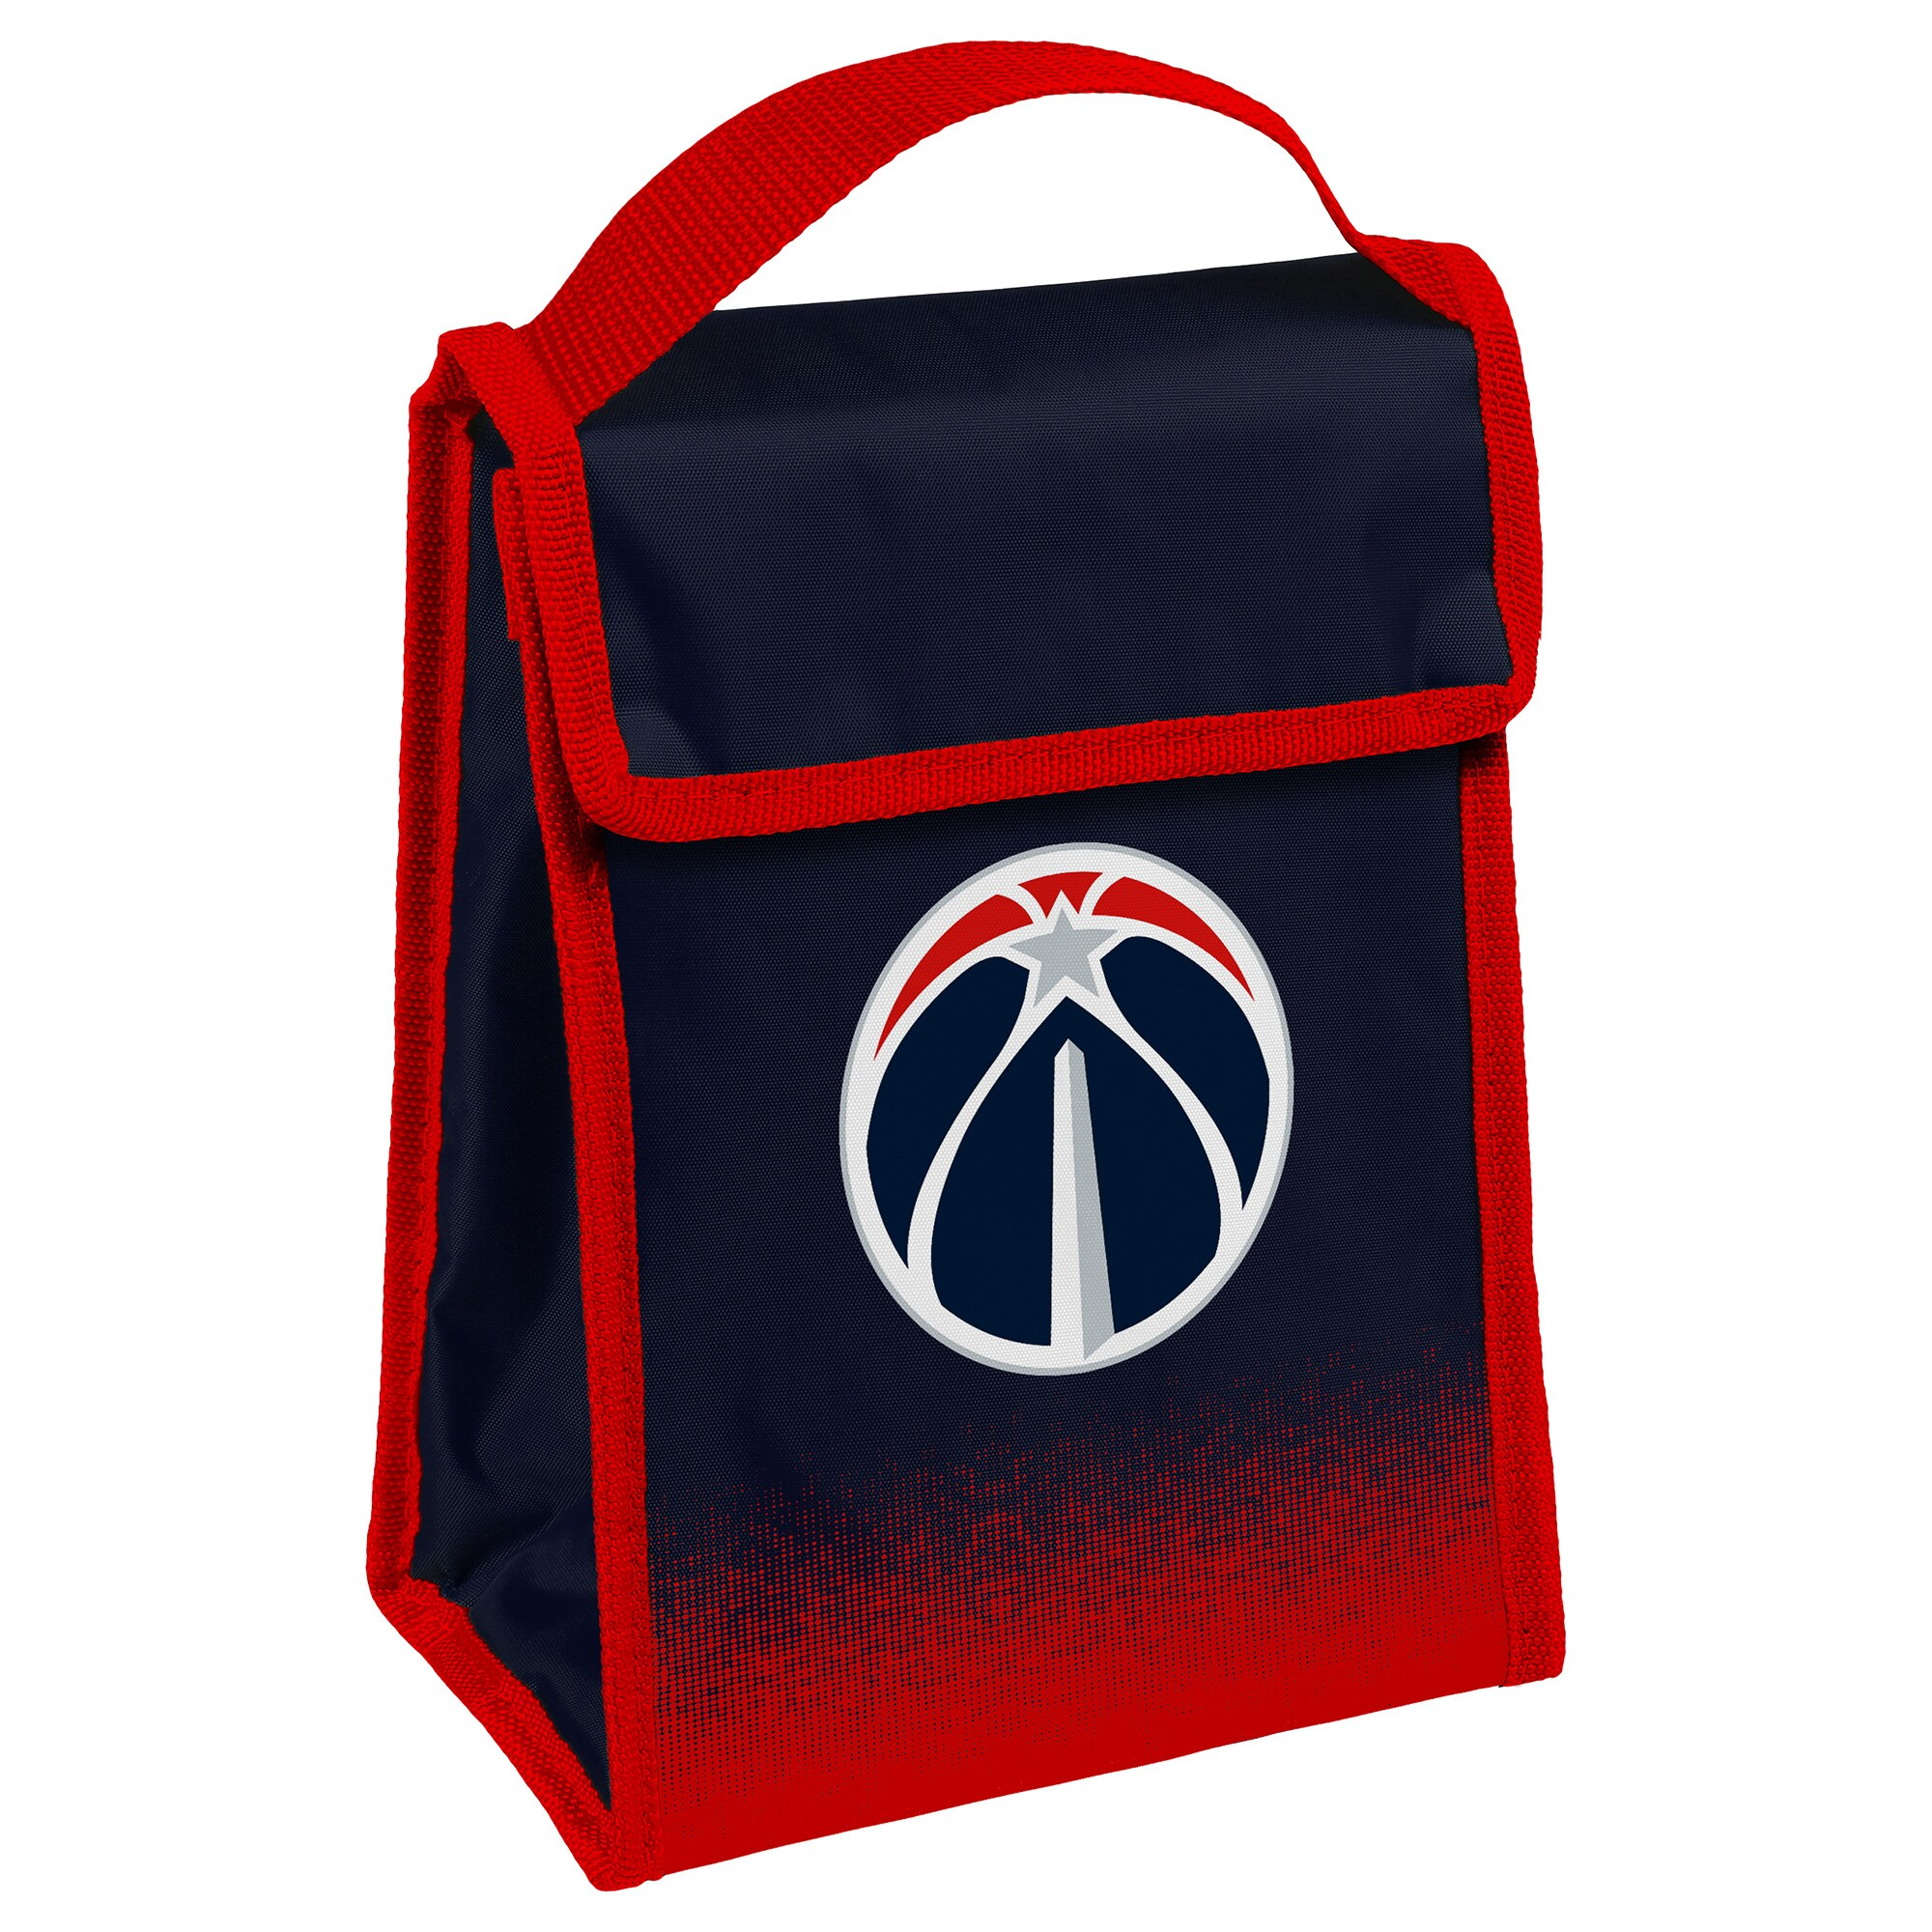 Washington Wizards Gradient Lunch Bag